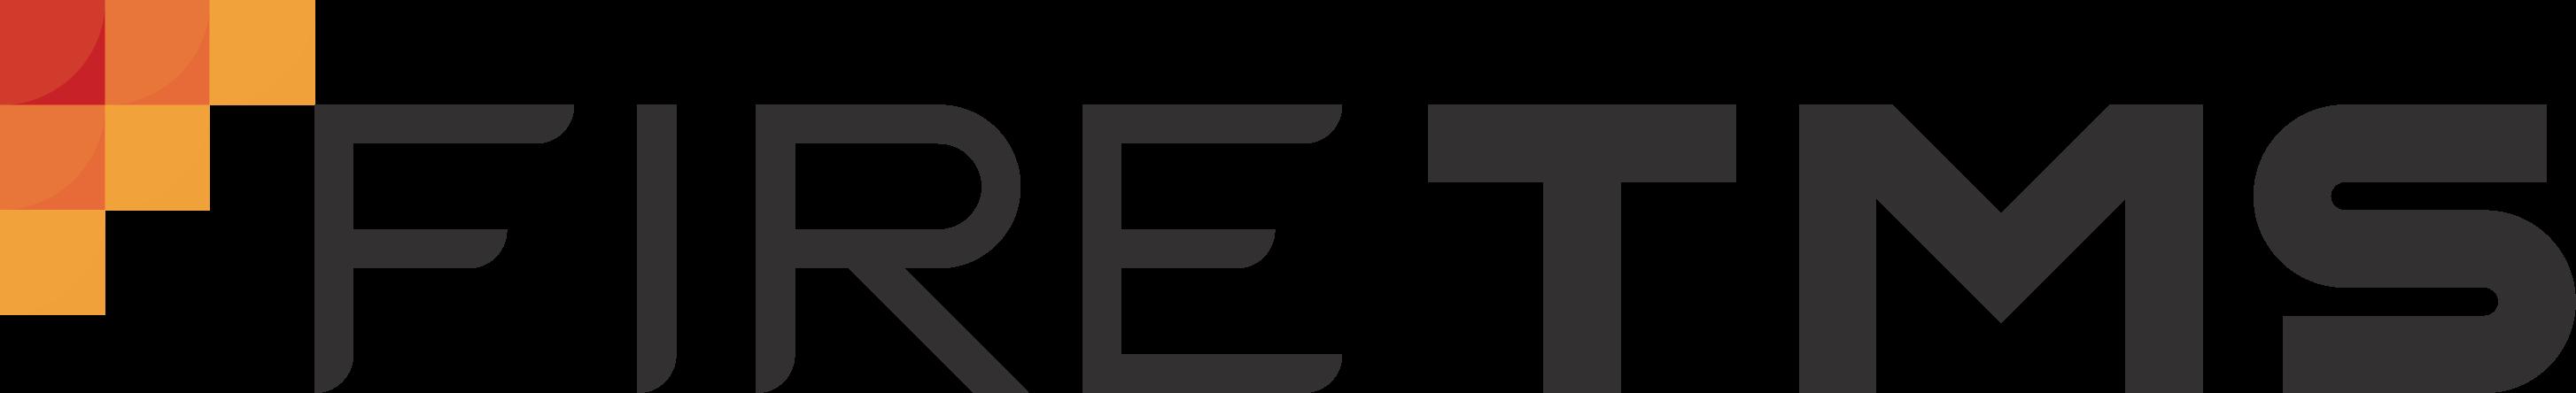 firetms_logo